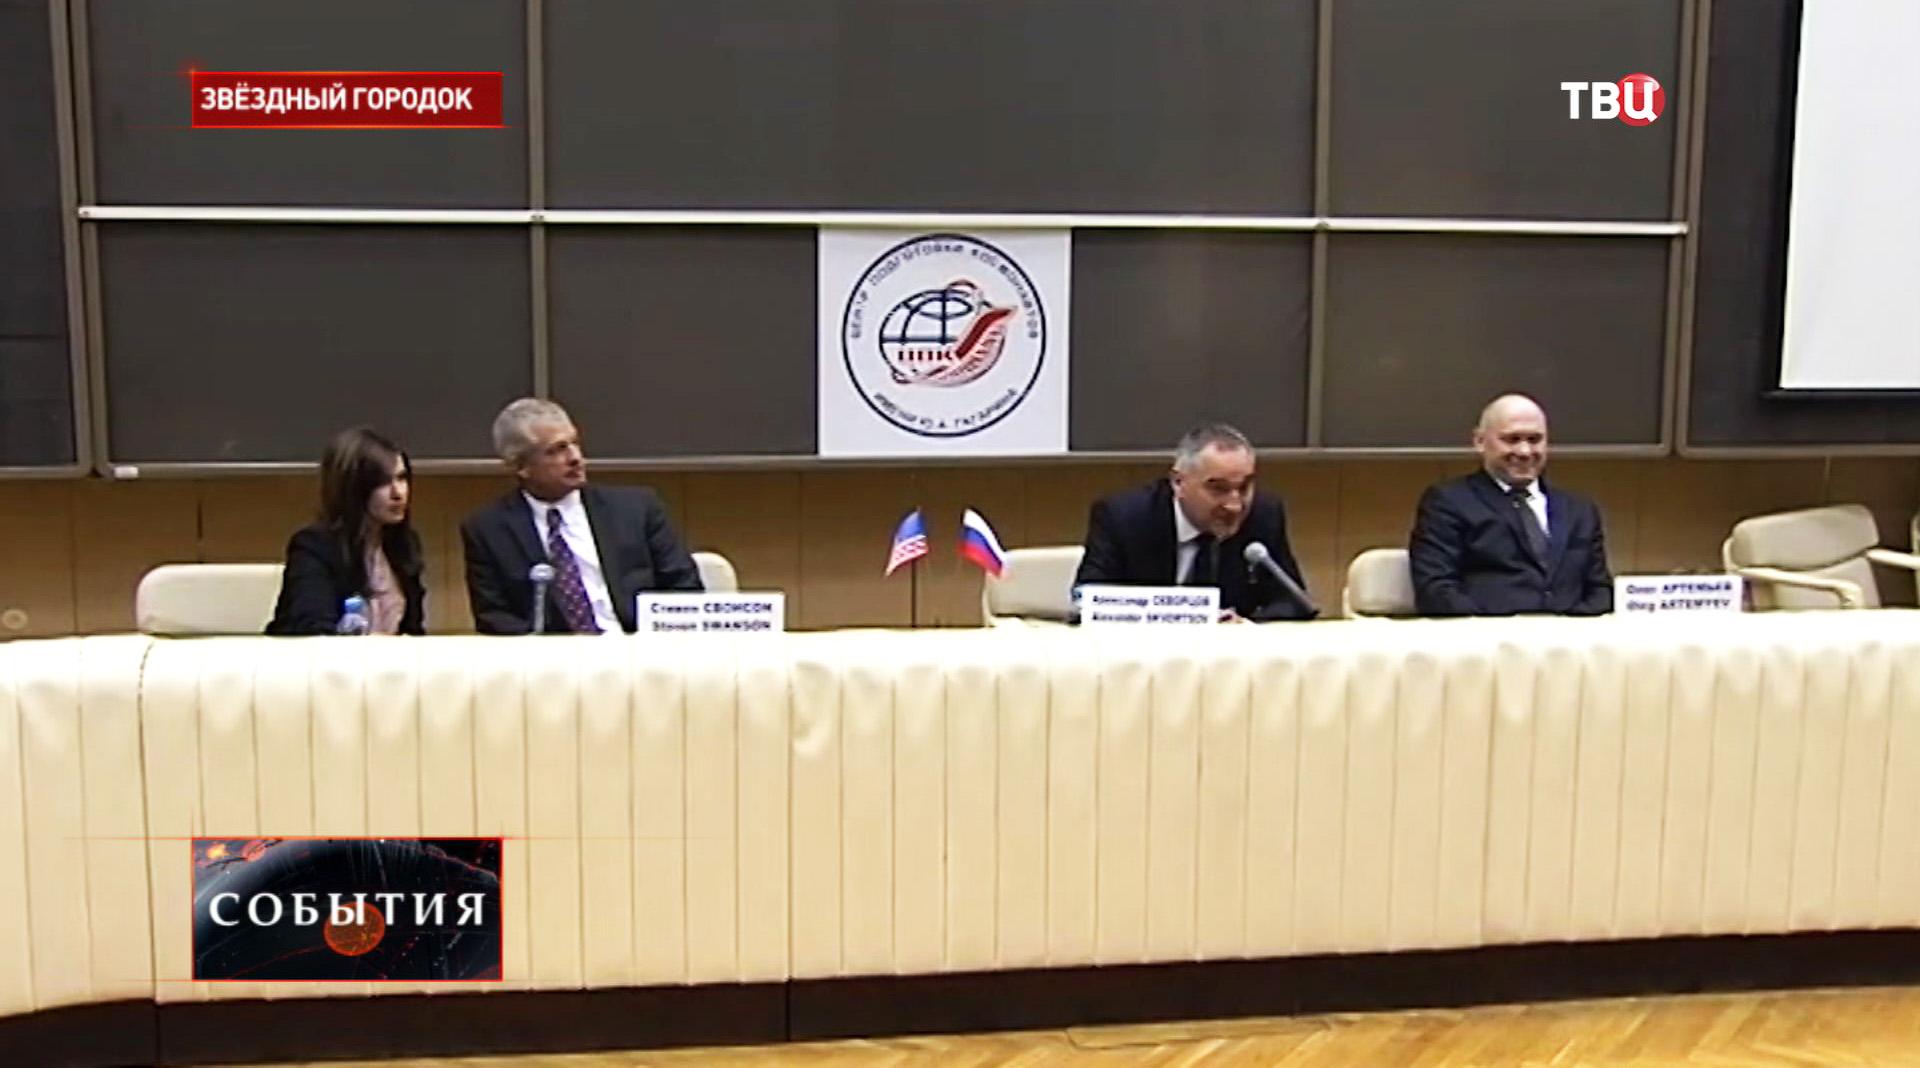 Пресс-конференция экипажа МКС